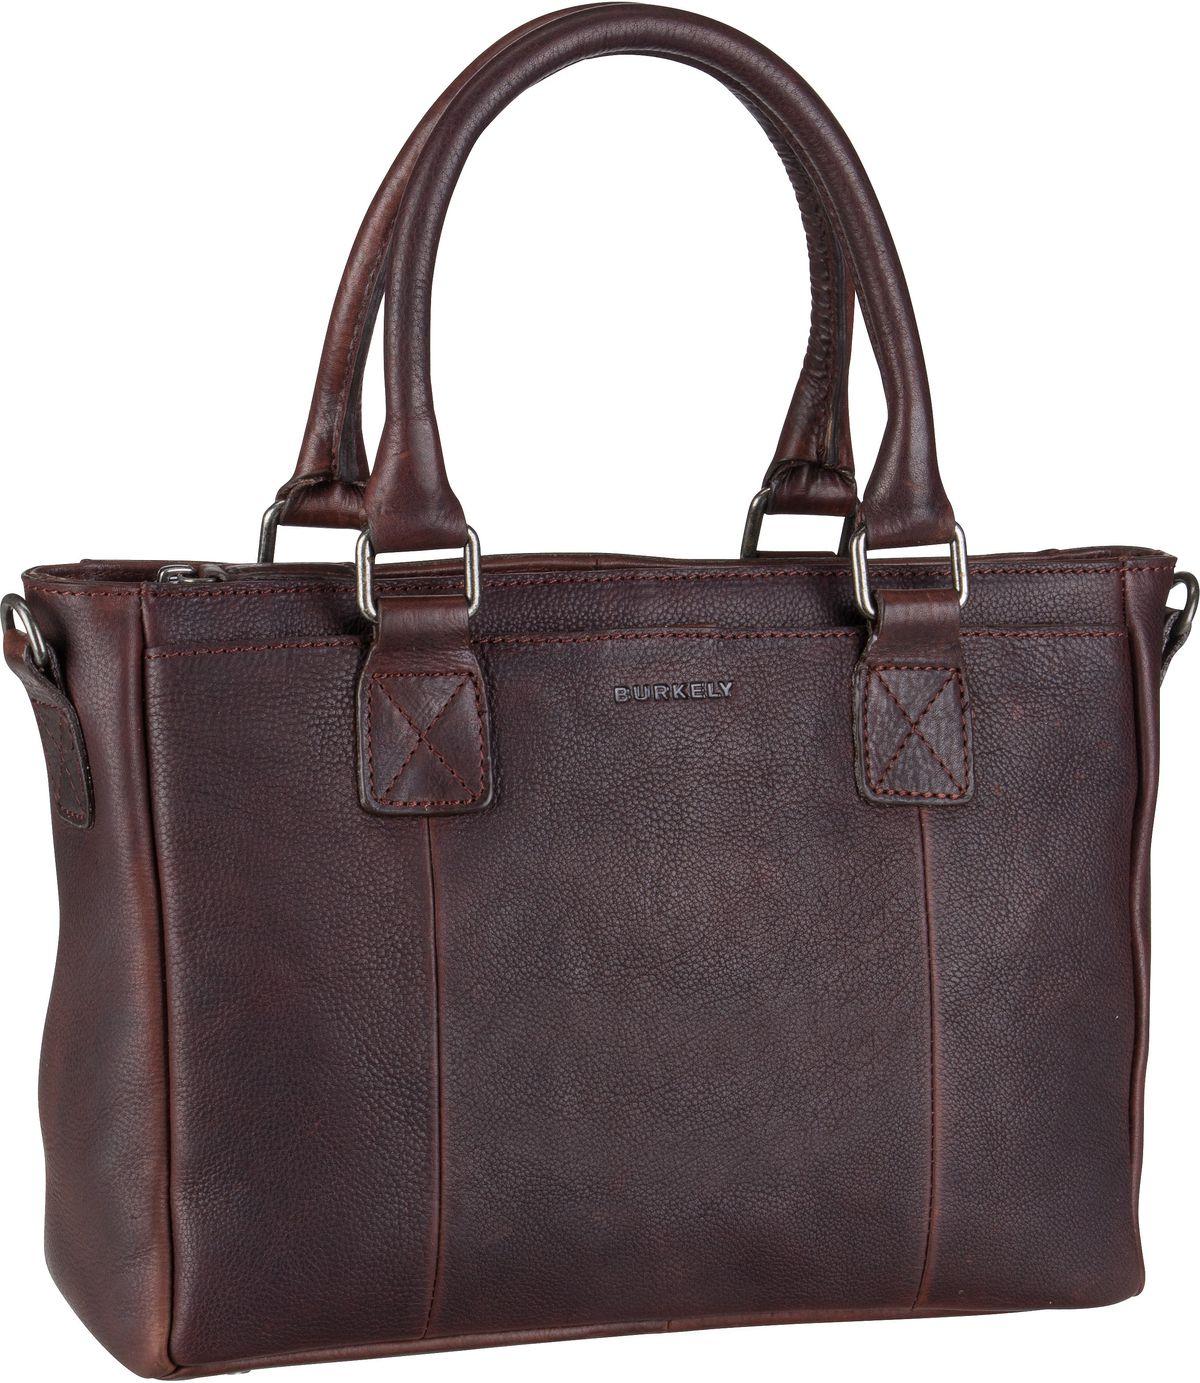 Burkely Handtasche Antique Avery Handbag S 6956 Brown